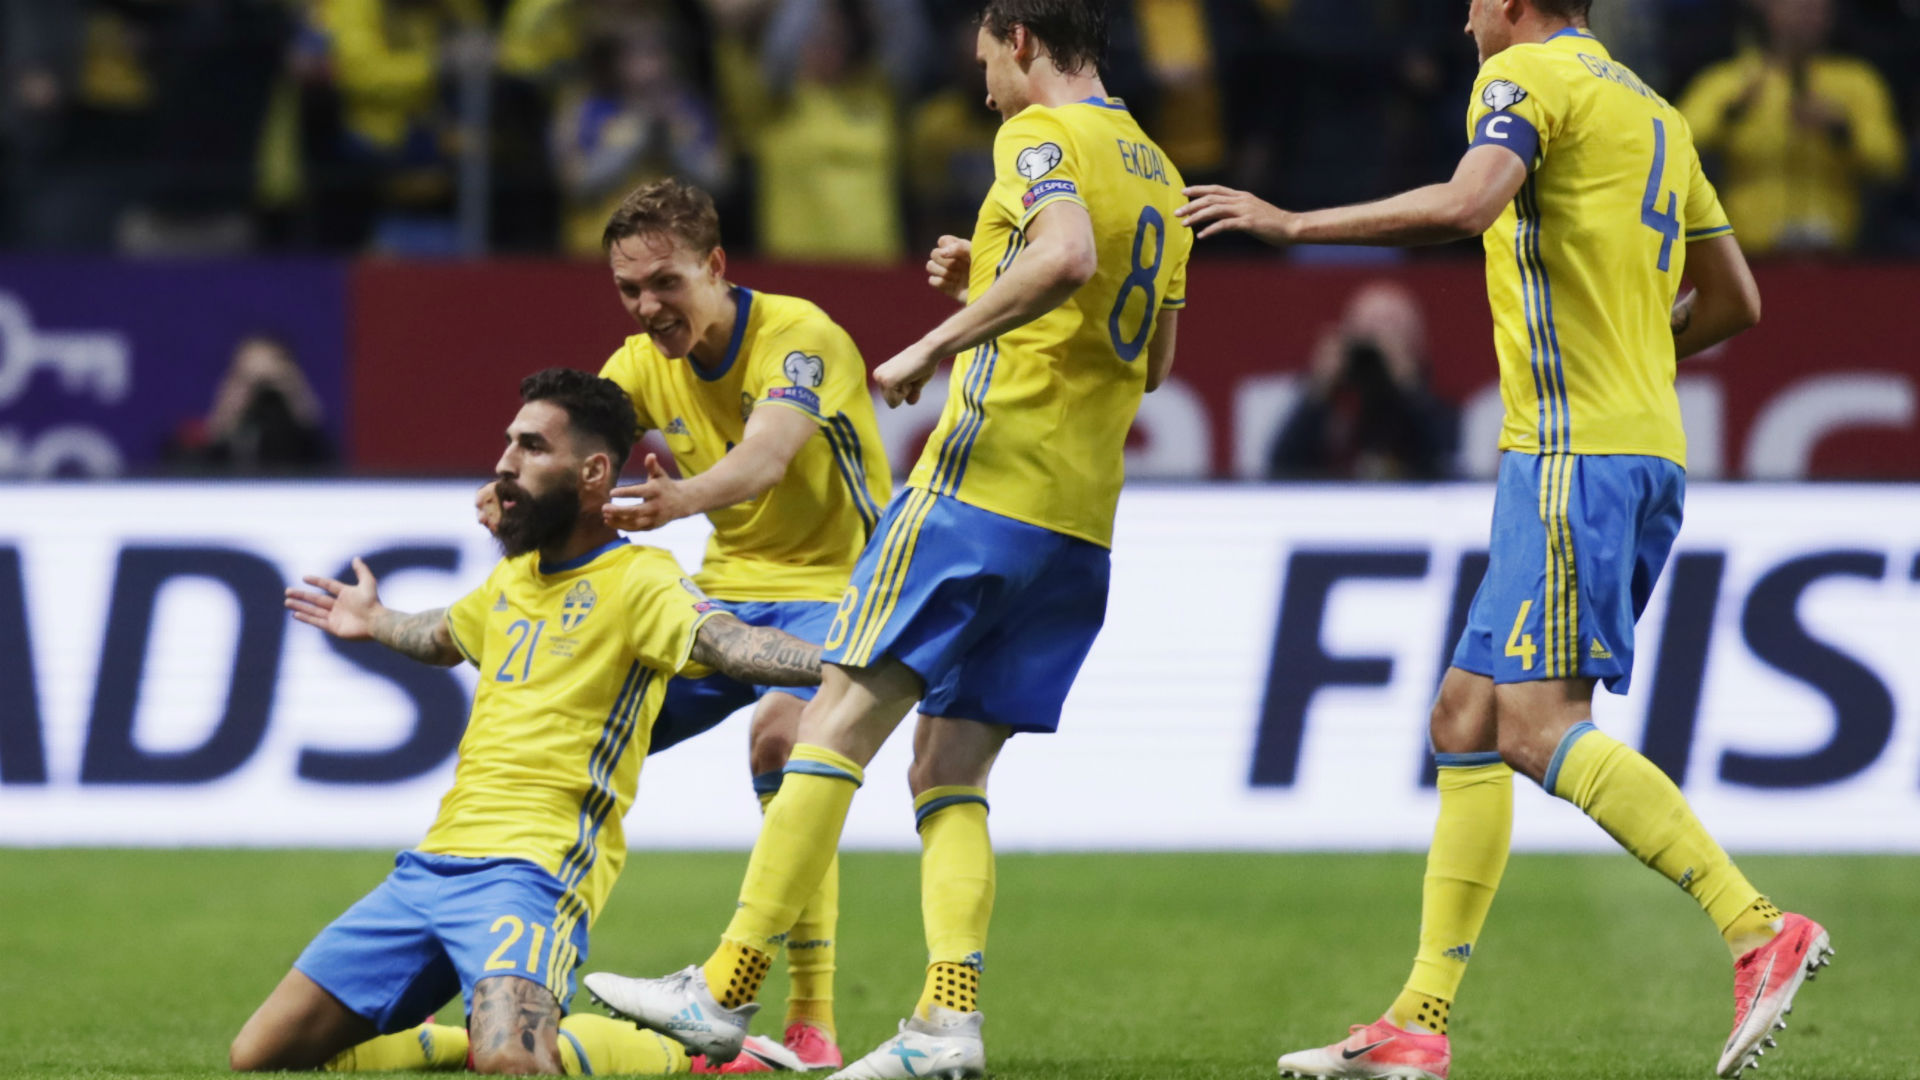 Qualificazioni Mondiali: Italia-Liechtenstein 5-0, Insigne trascina gli azzurri